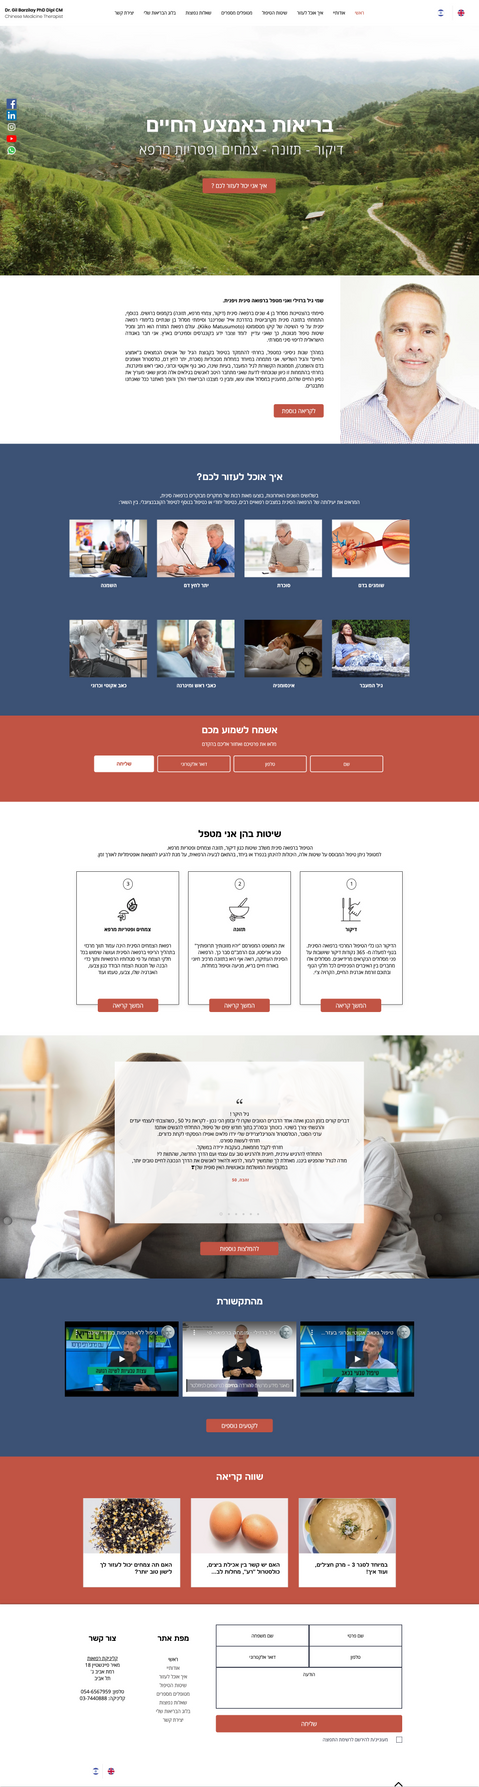 Branding / Design / Development